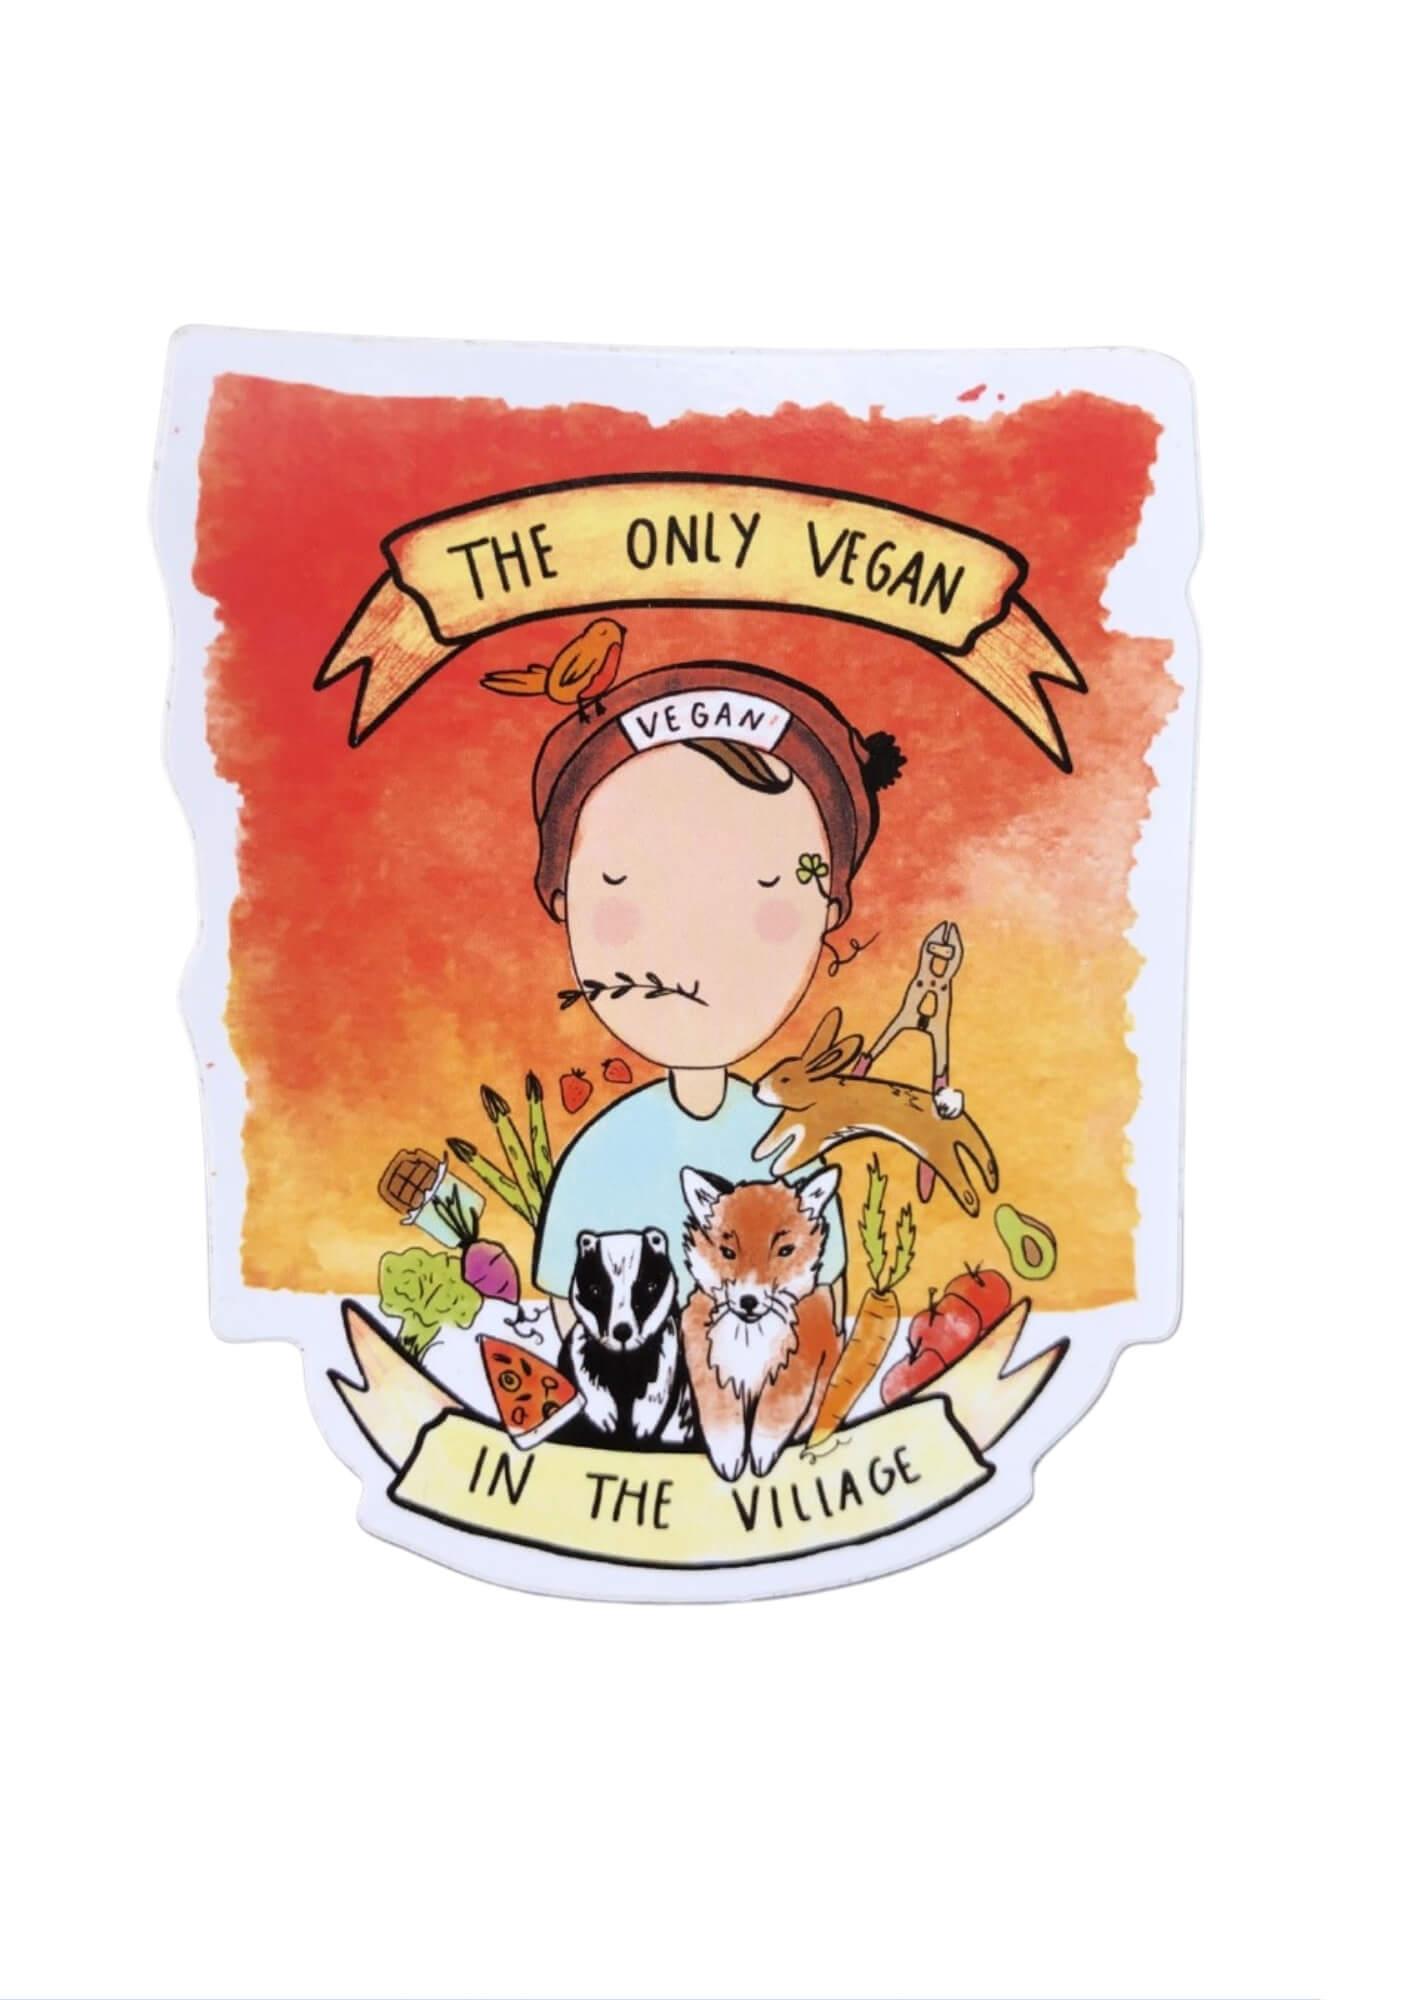 Vinyl Vegan Sticker - Only Vegan In The Village